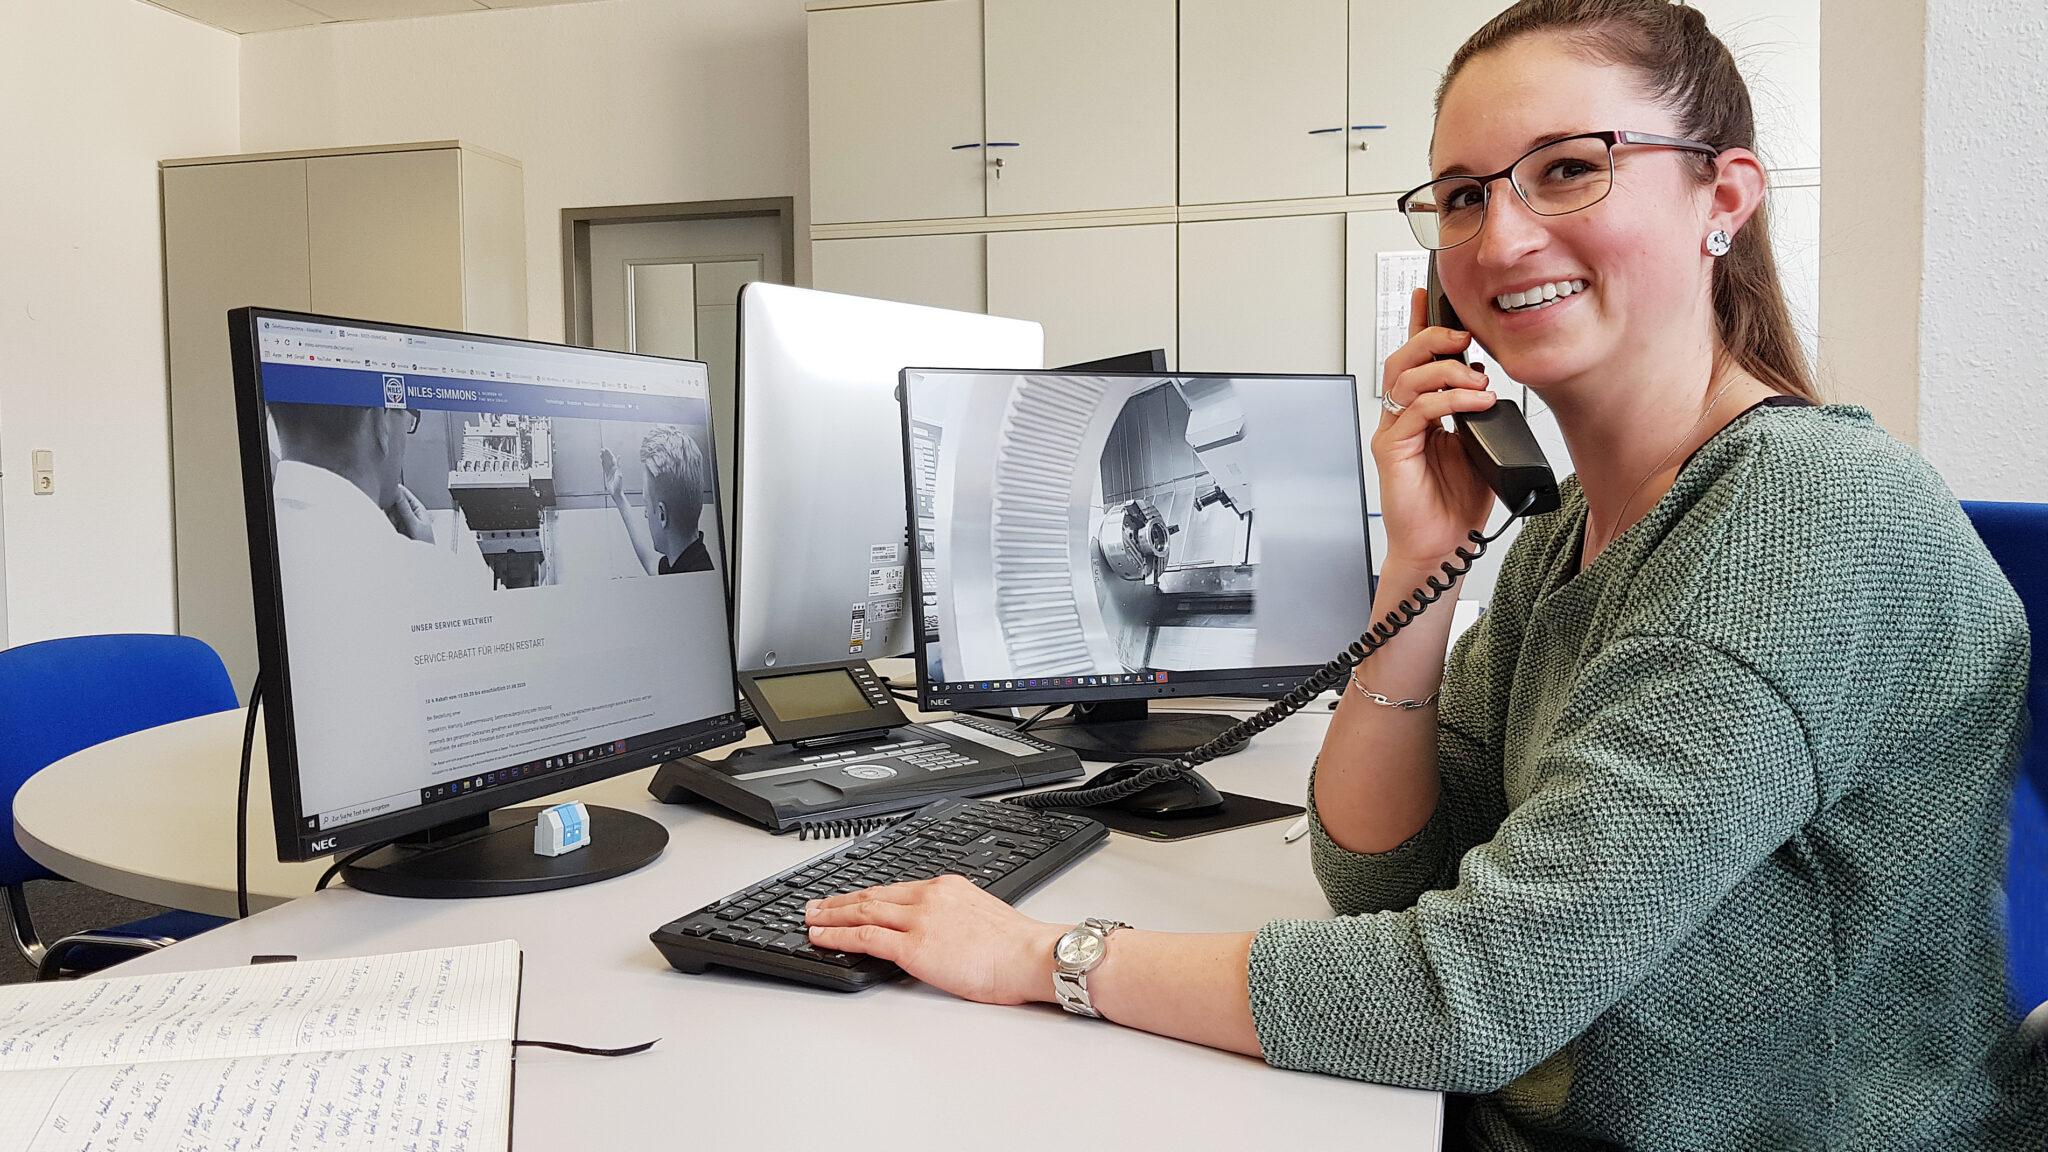 Werkzeugmaschinenbau Service: Hotline 24/7 / Machine Tool Service: Hotline 24/7